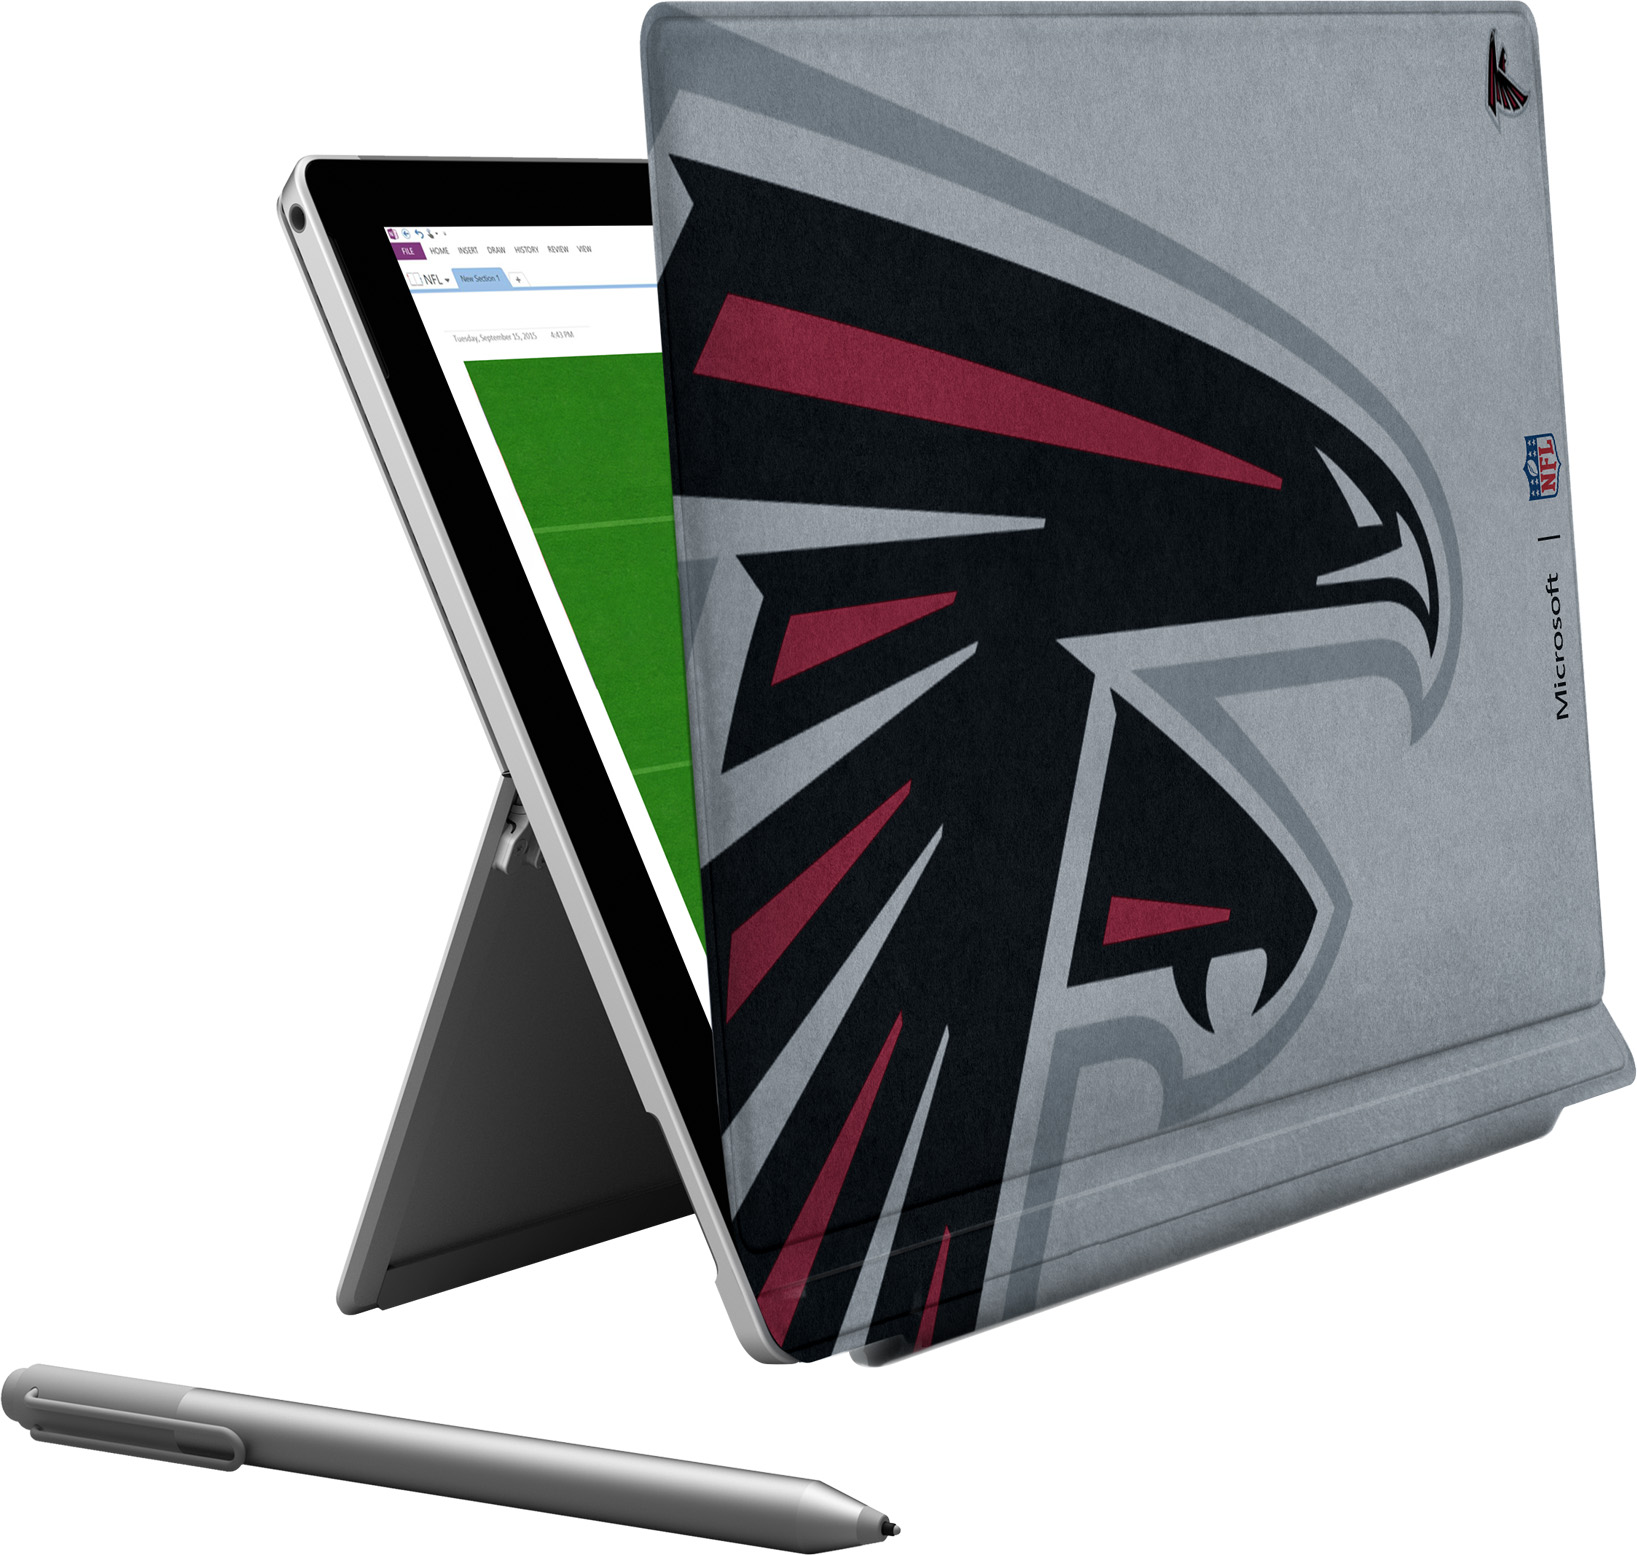 Microsoft Surface Pro 4 Atlanta Falcons Type Cover